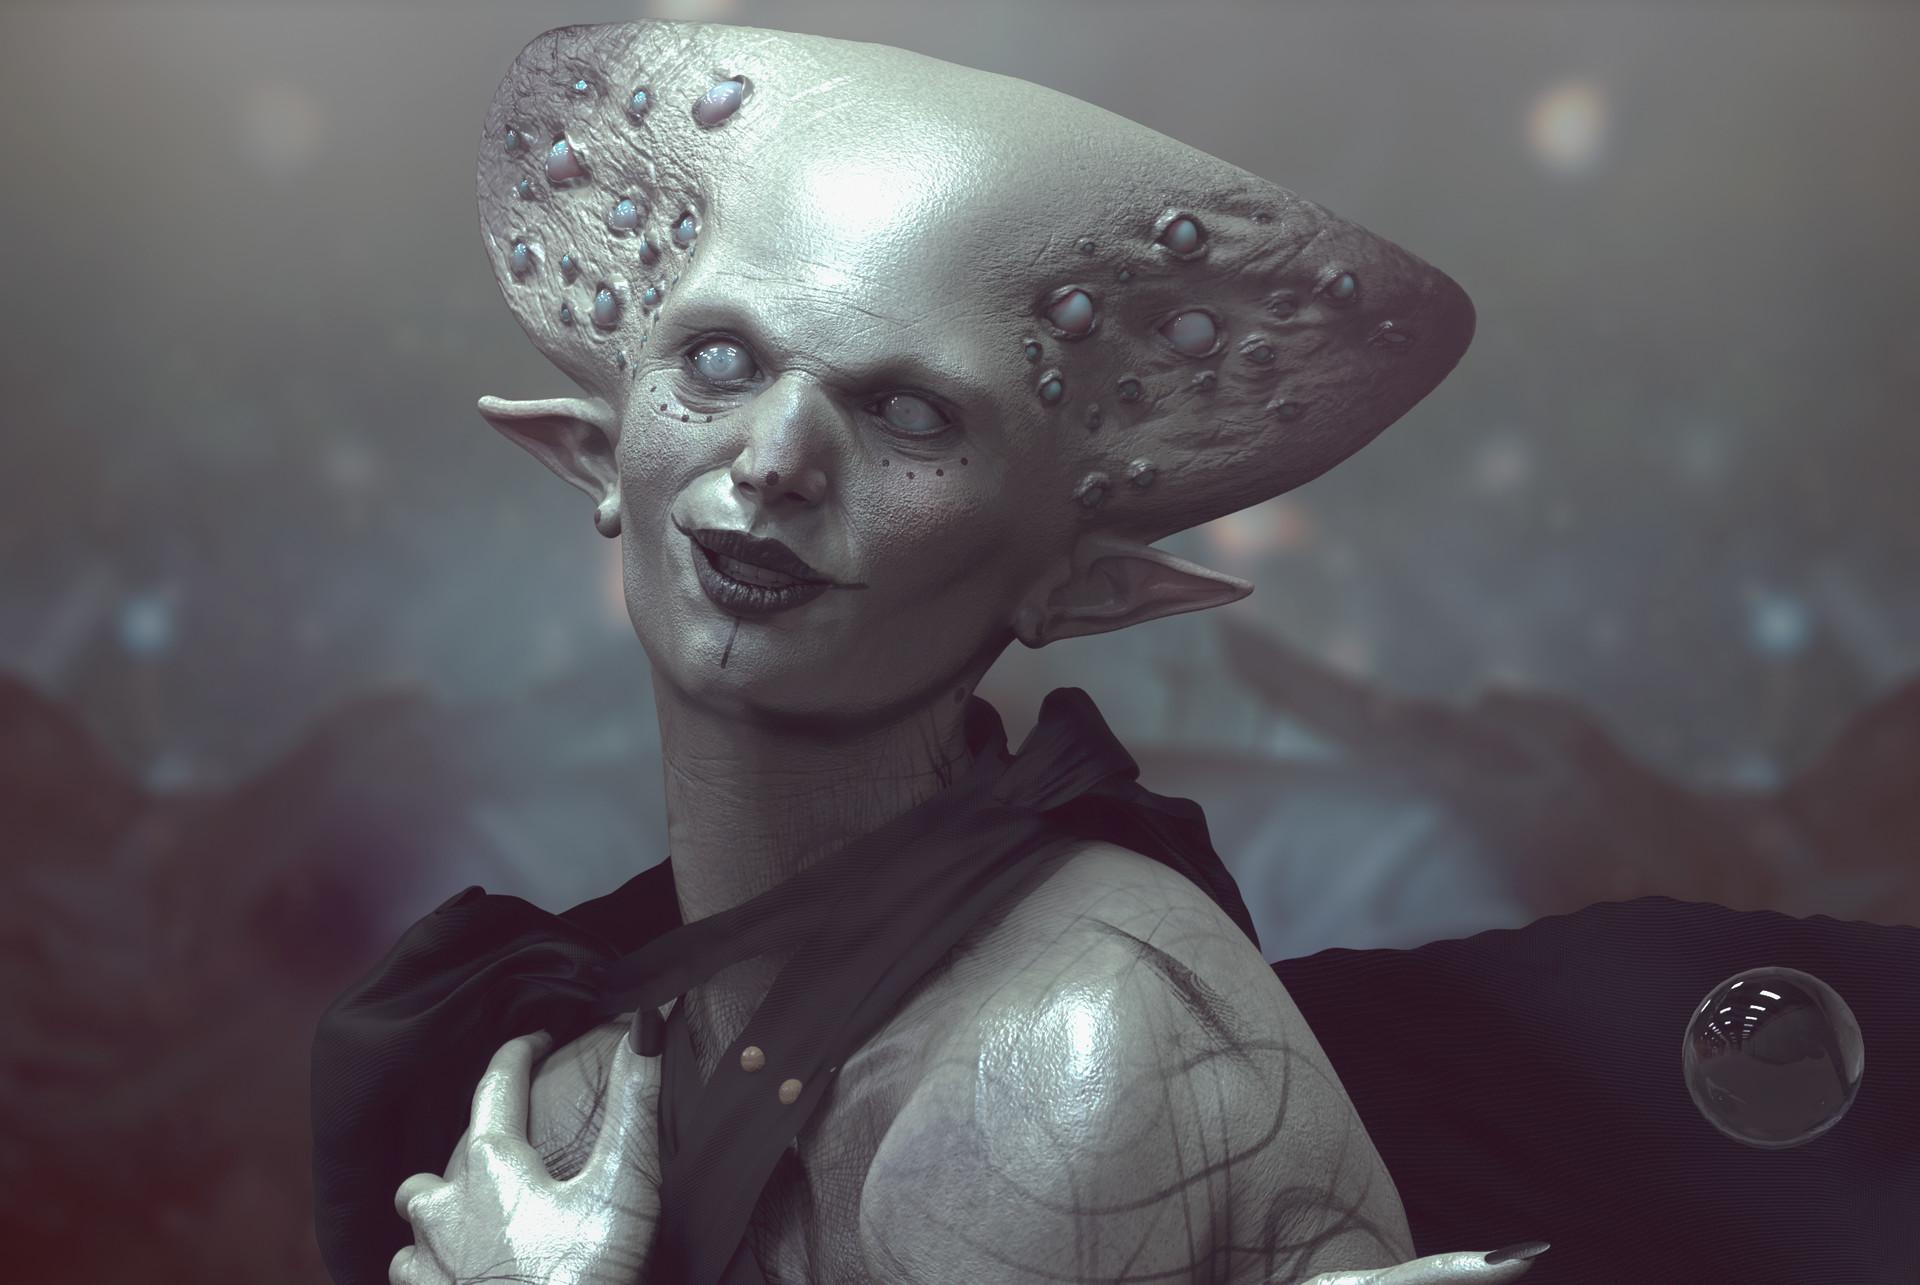 Gilberto soren zaragoza witch of time 2